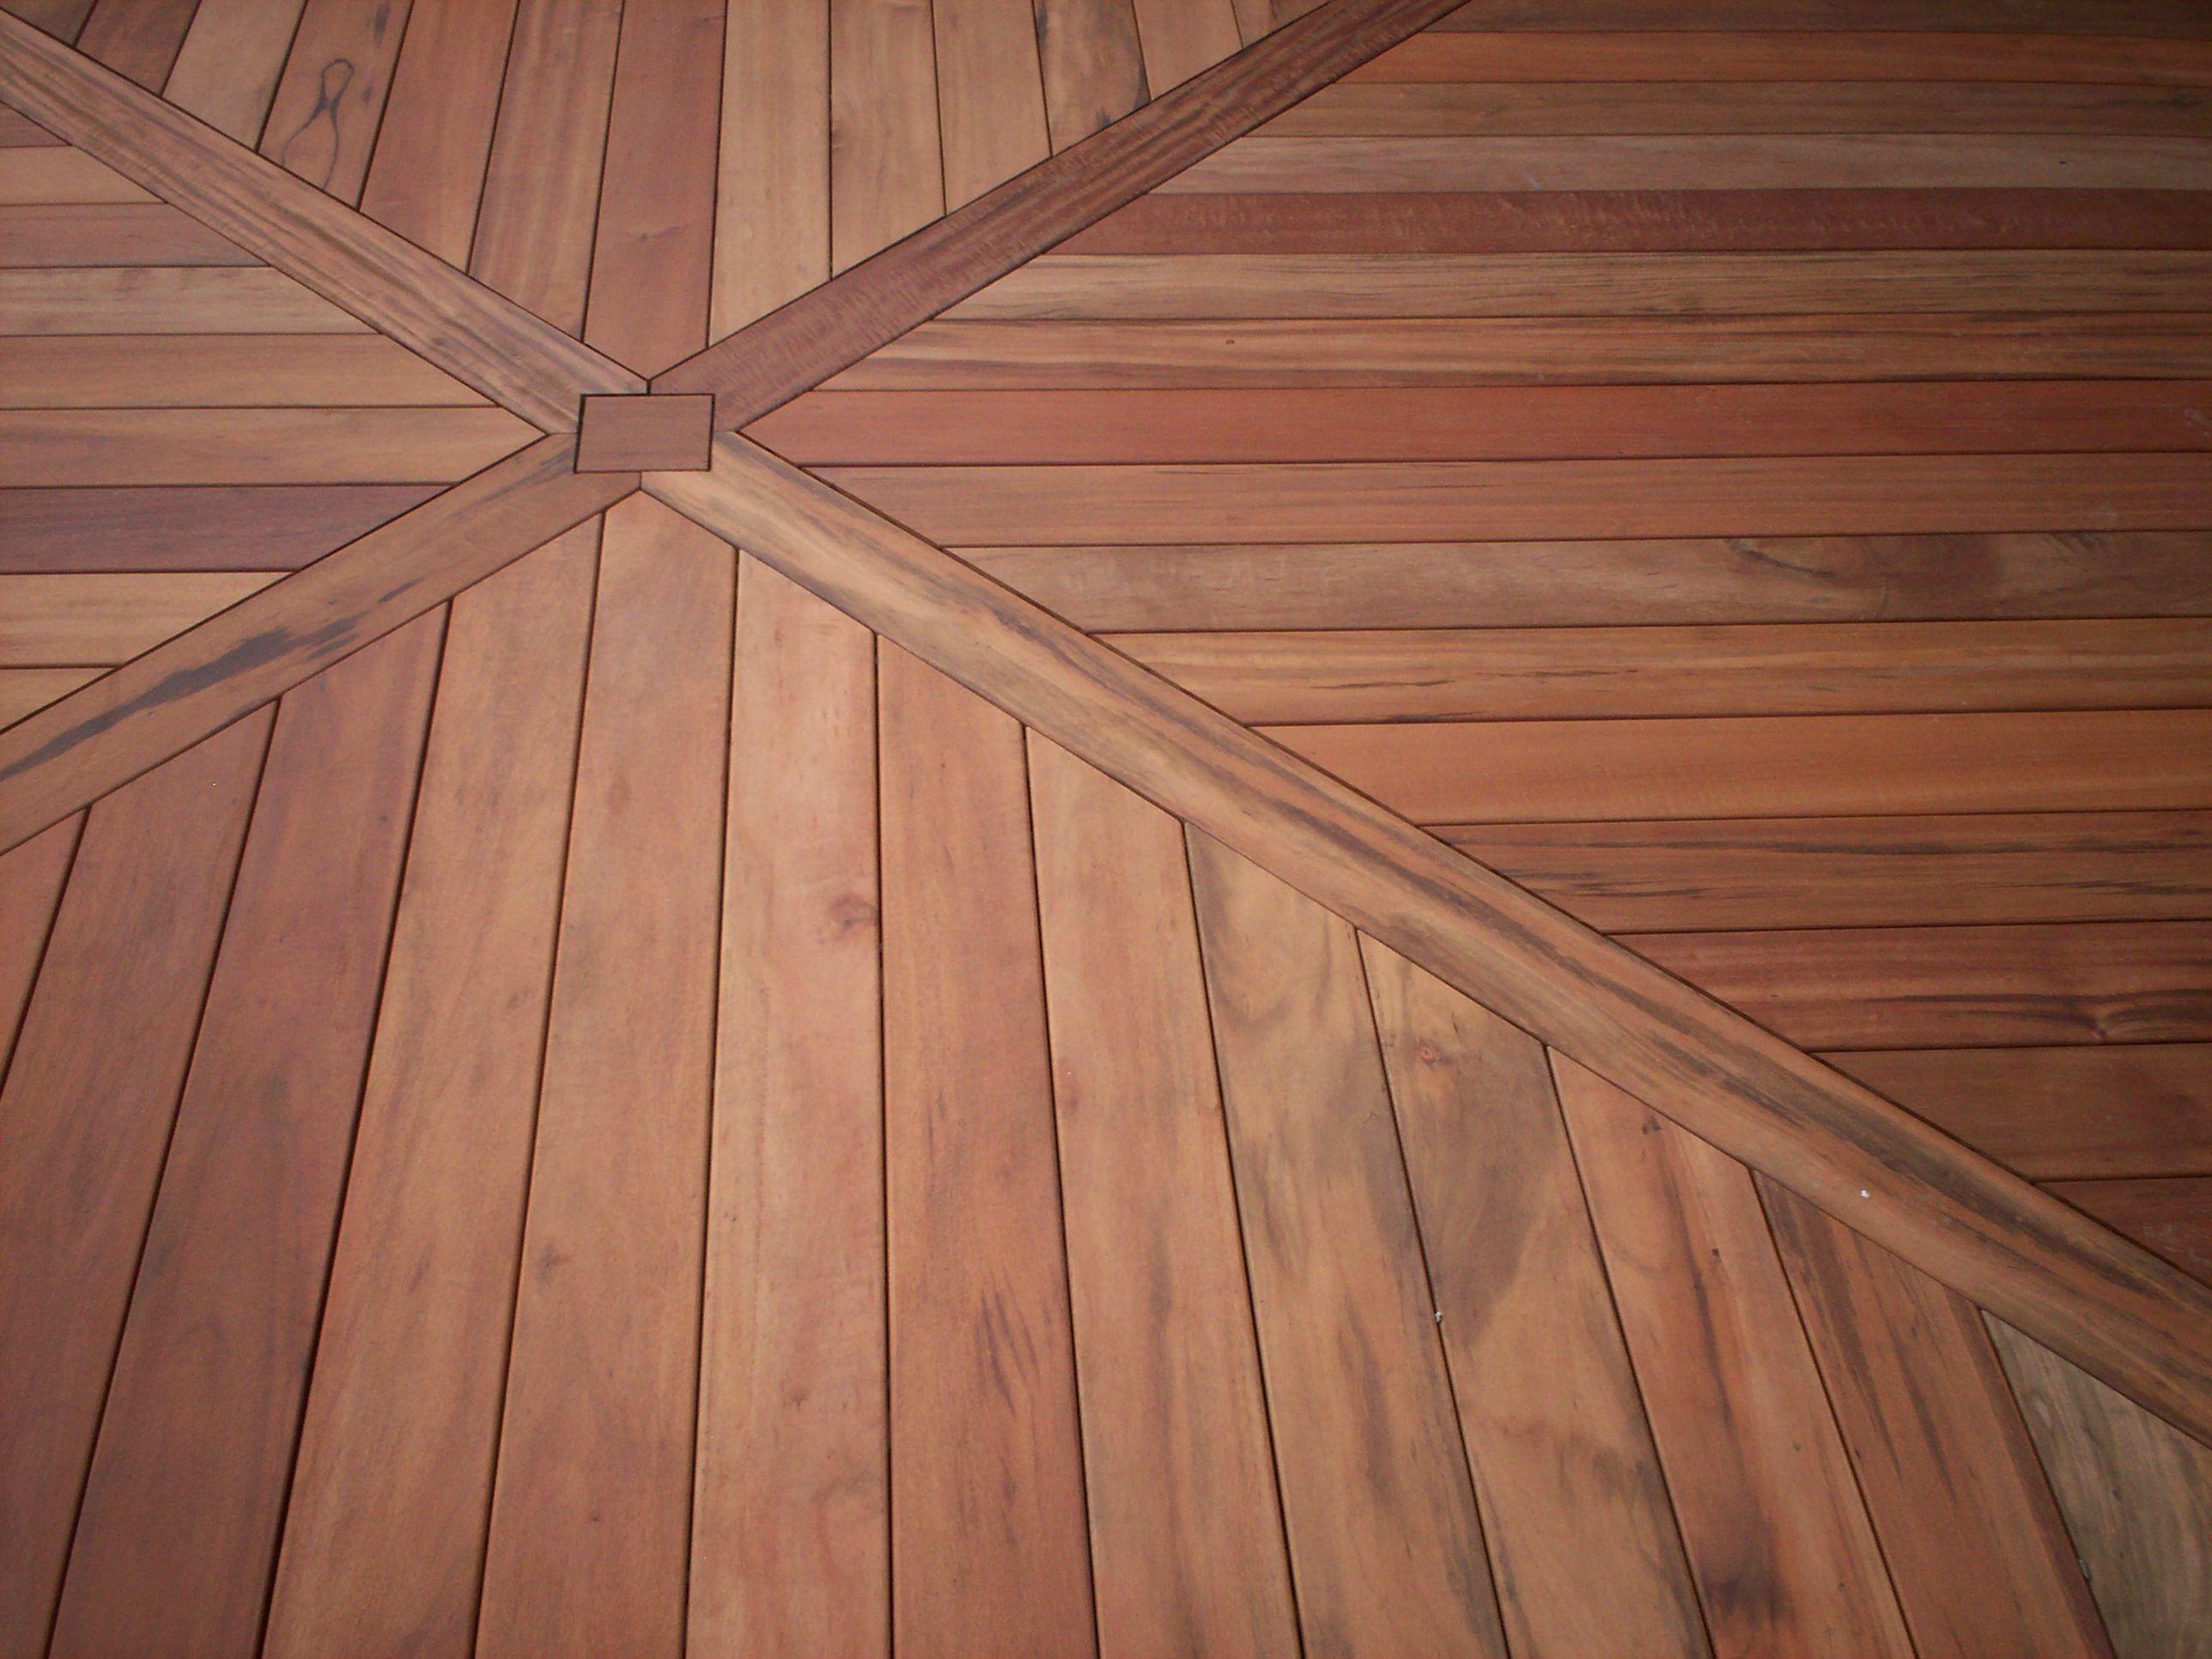 Best 25 deck flooring ideas on pinterest pallet decking pallet best 25 deck flooring ideas on pinterest pallet decking pallet patio decks and pallet patio baanklon Image collections